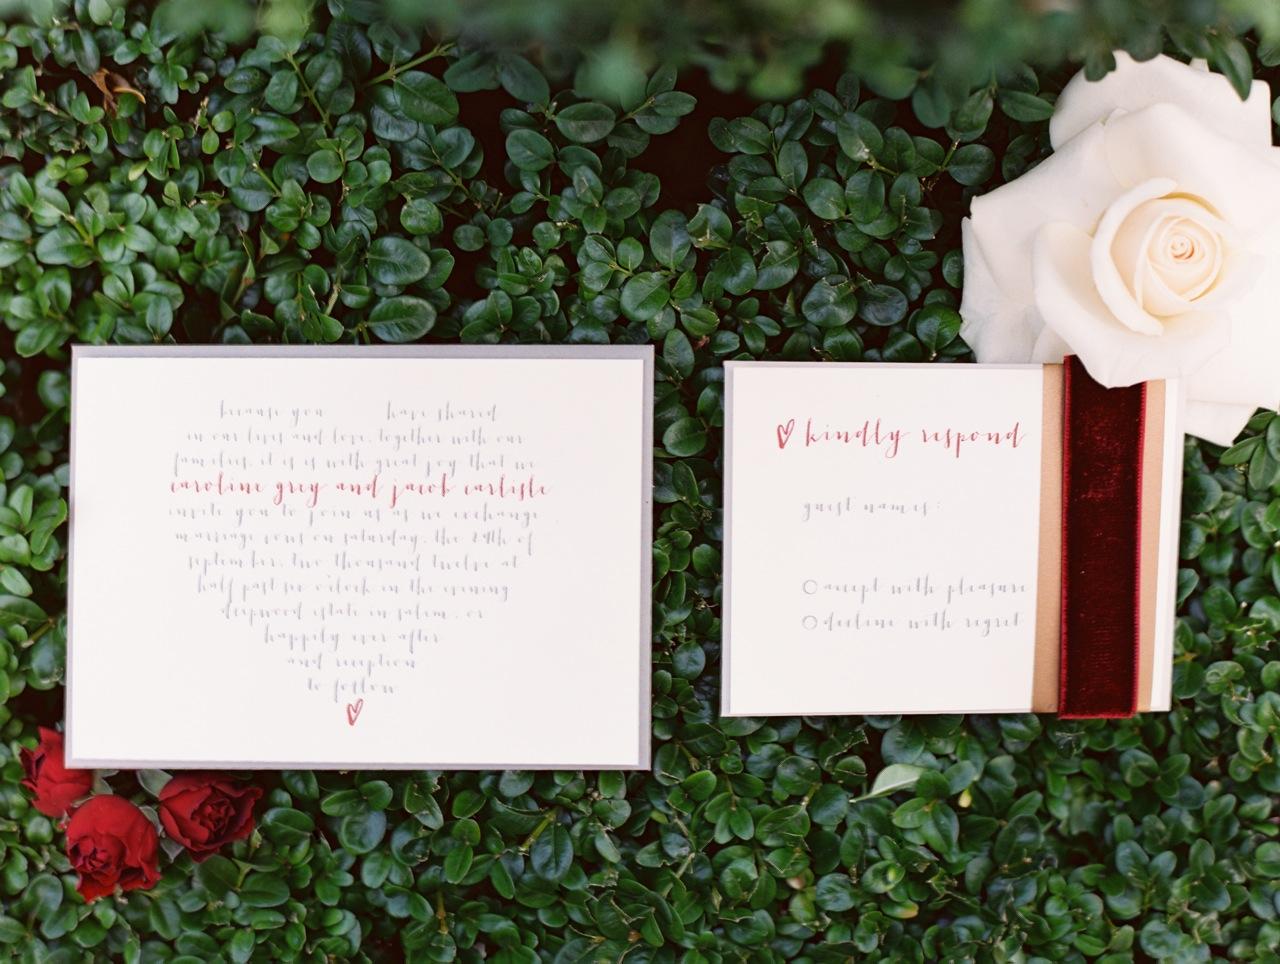 priglasheniya-na-svadbu-s-barhatnym-dekorom Идеи для свадеб со стилем, тематические свадьбы